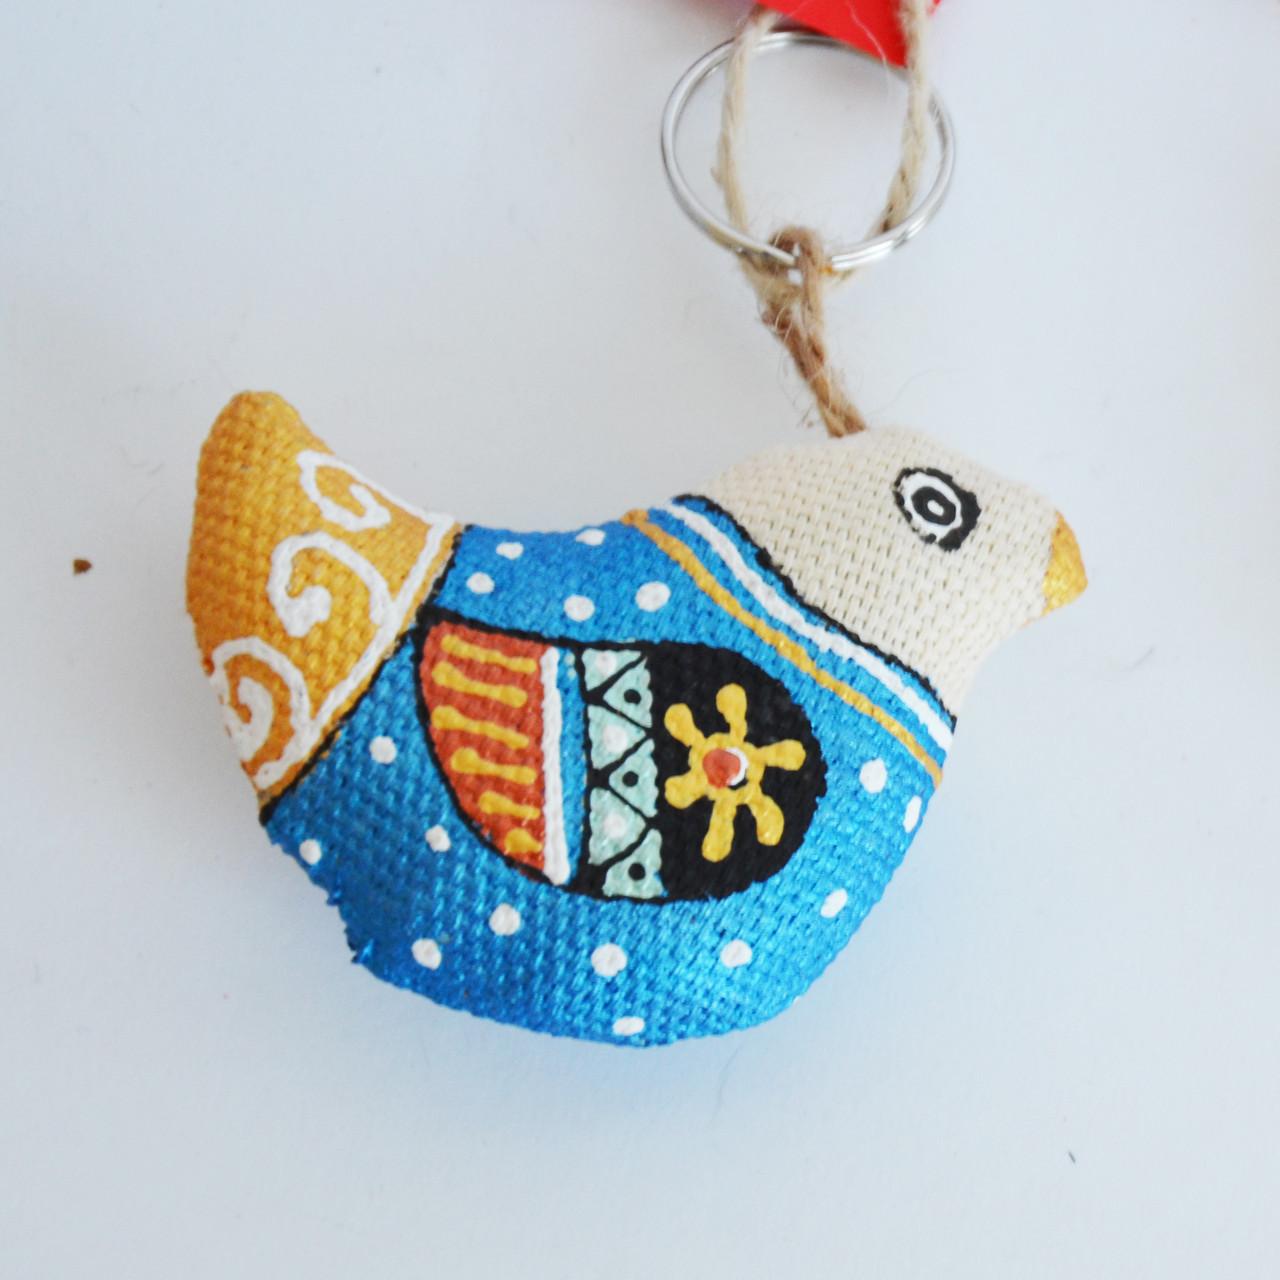 Брелок Голубой Воробушек. Украинский сувенир., фото 1